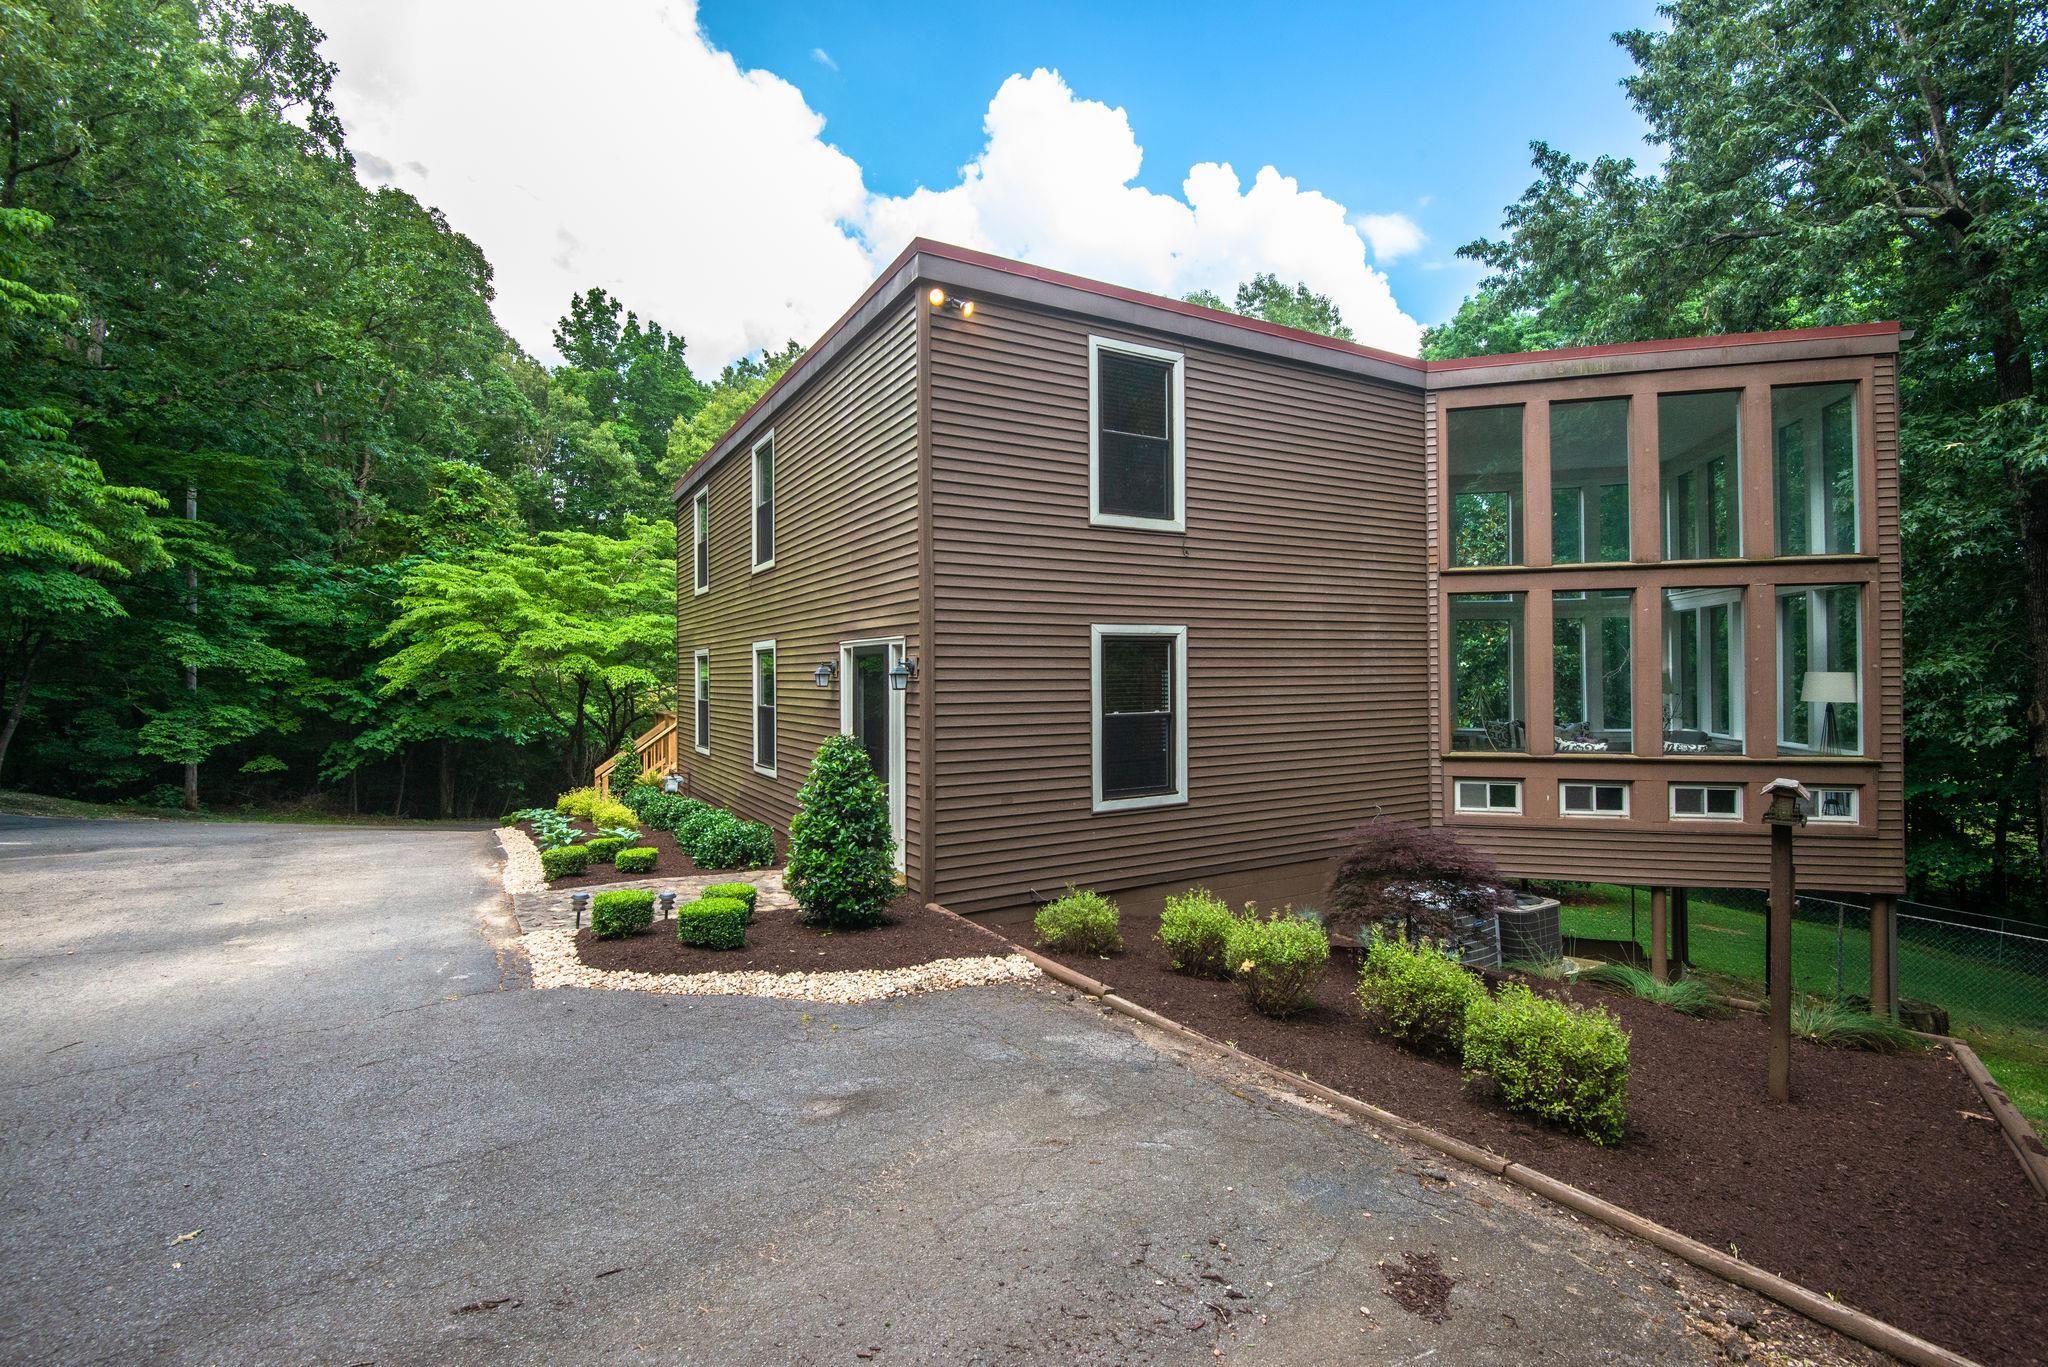 218 Druid Hills Dr, Dickson, TN 37055 - Dickson, TN real estate listing